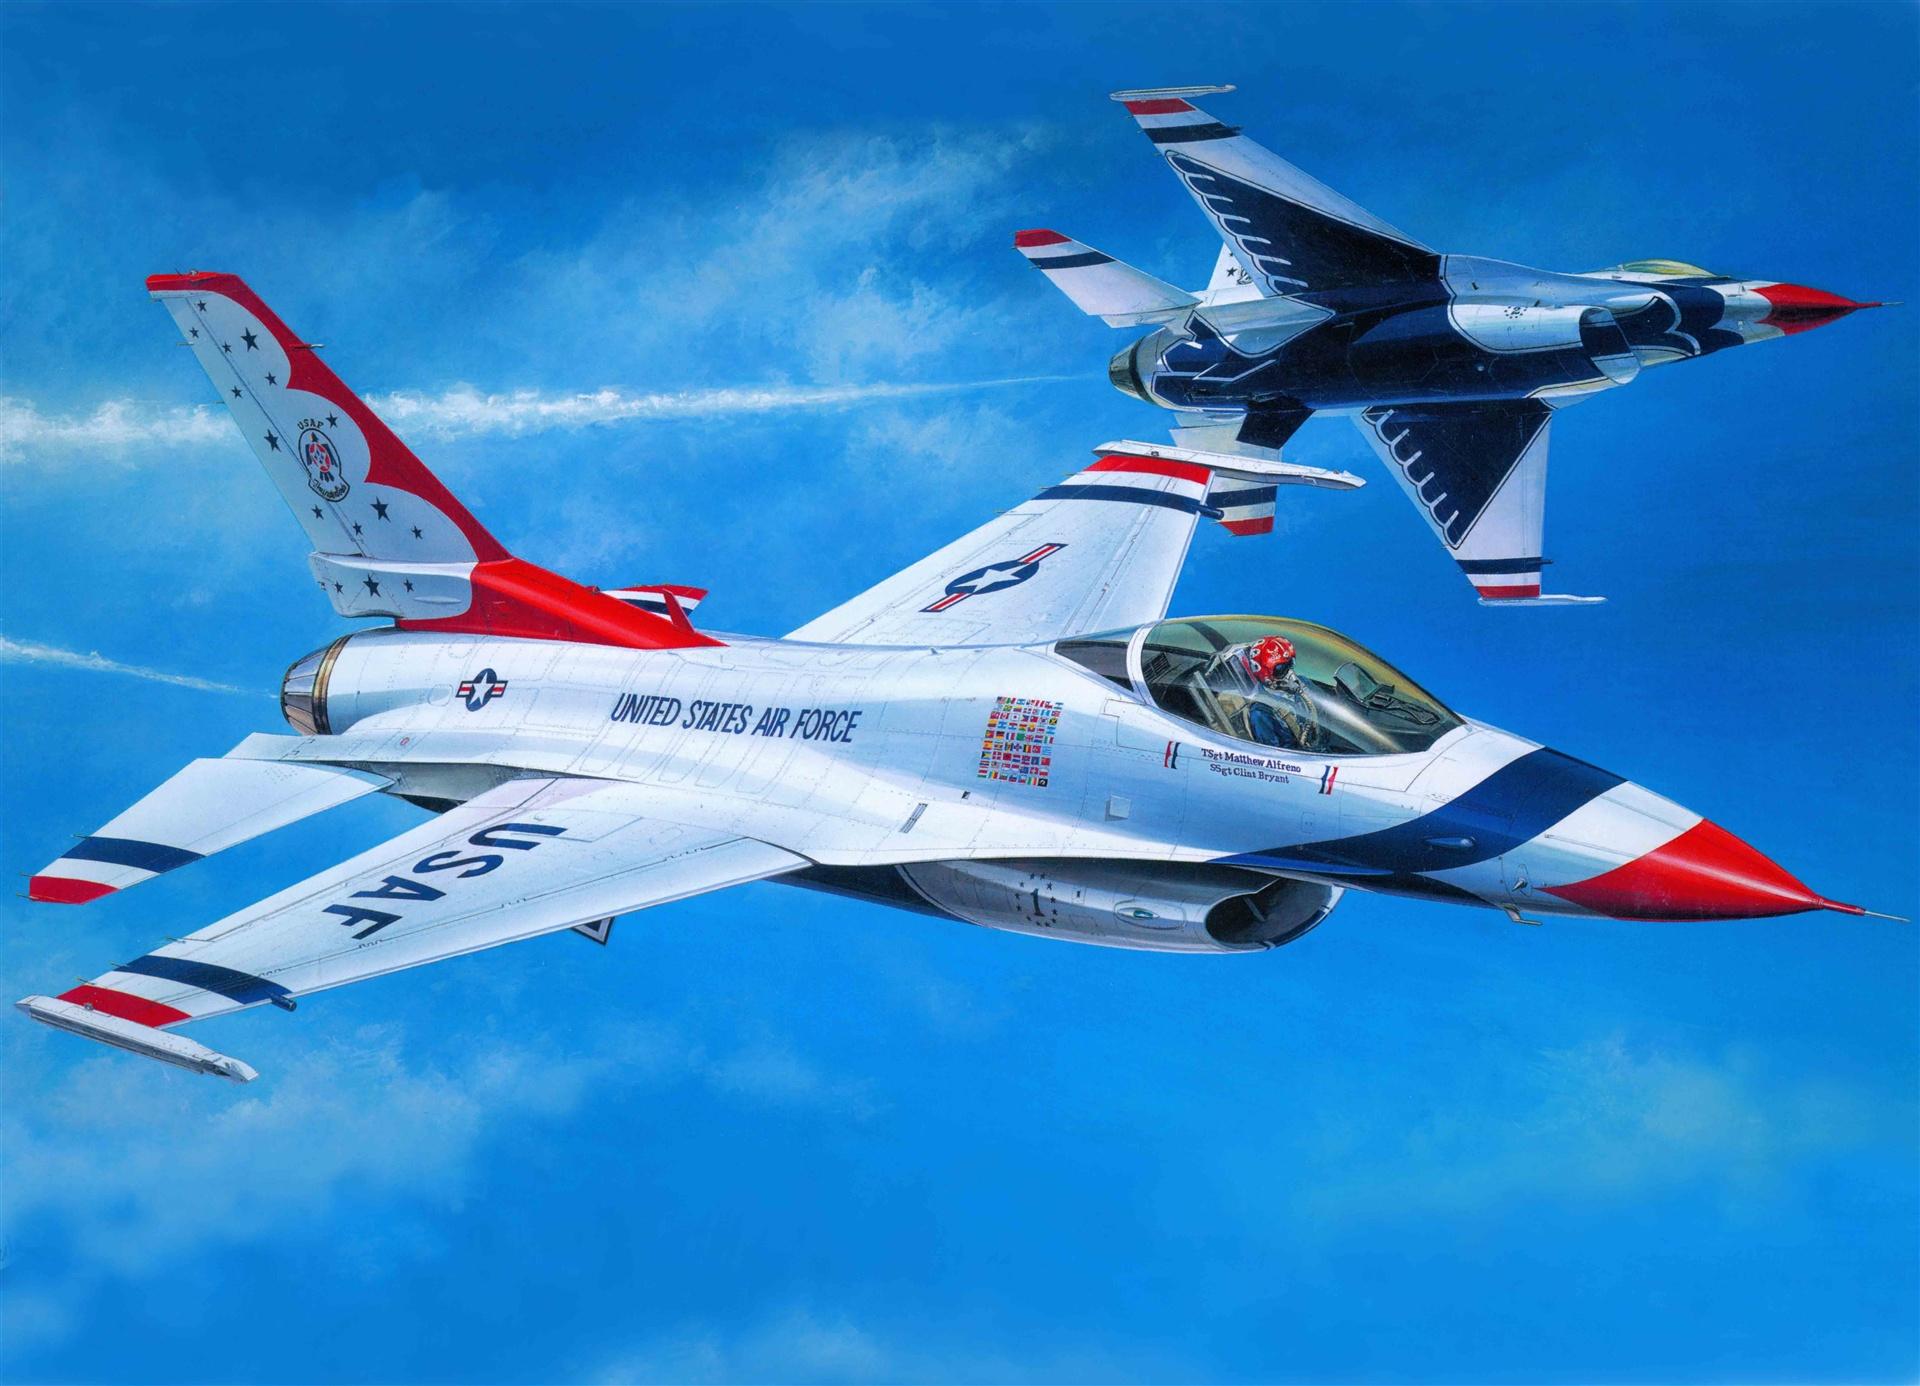 wallpaper   Aviation   aircraft art air the Air Force the United 1920x1386